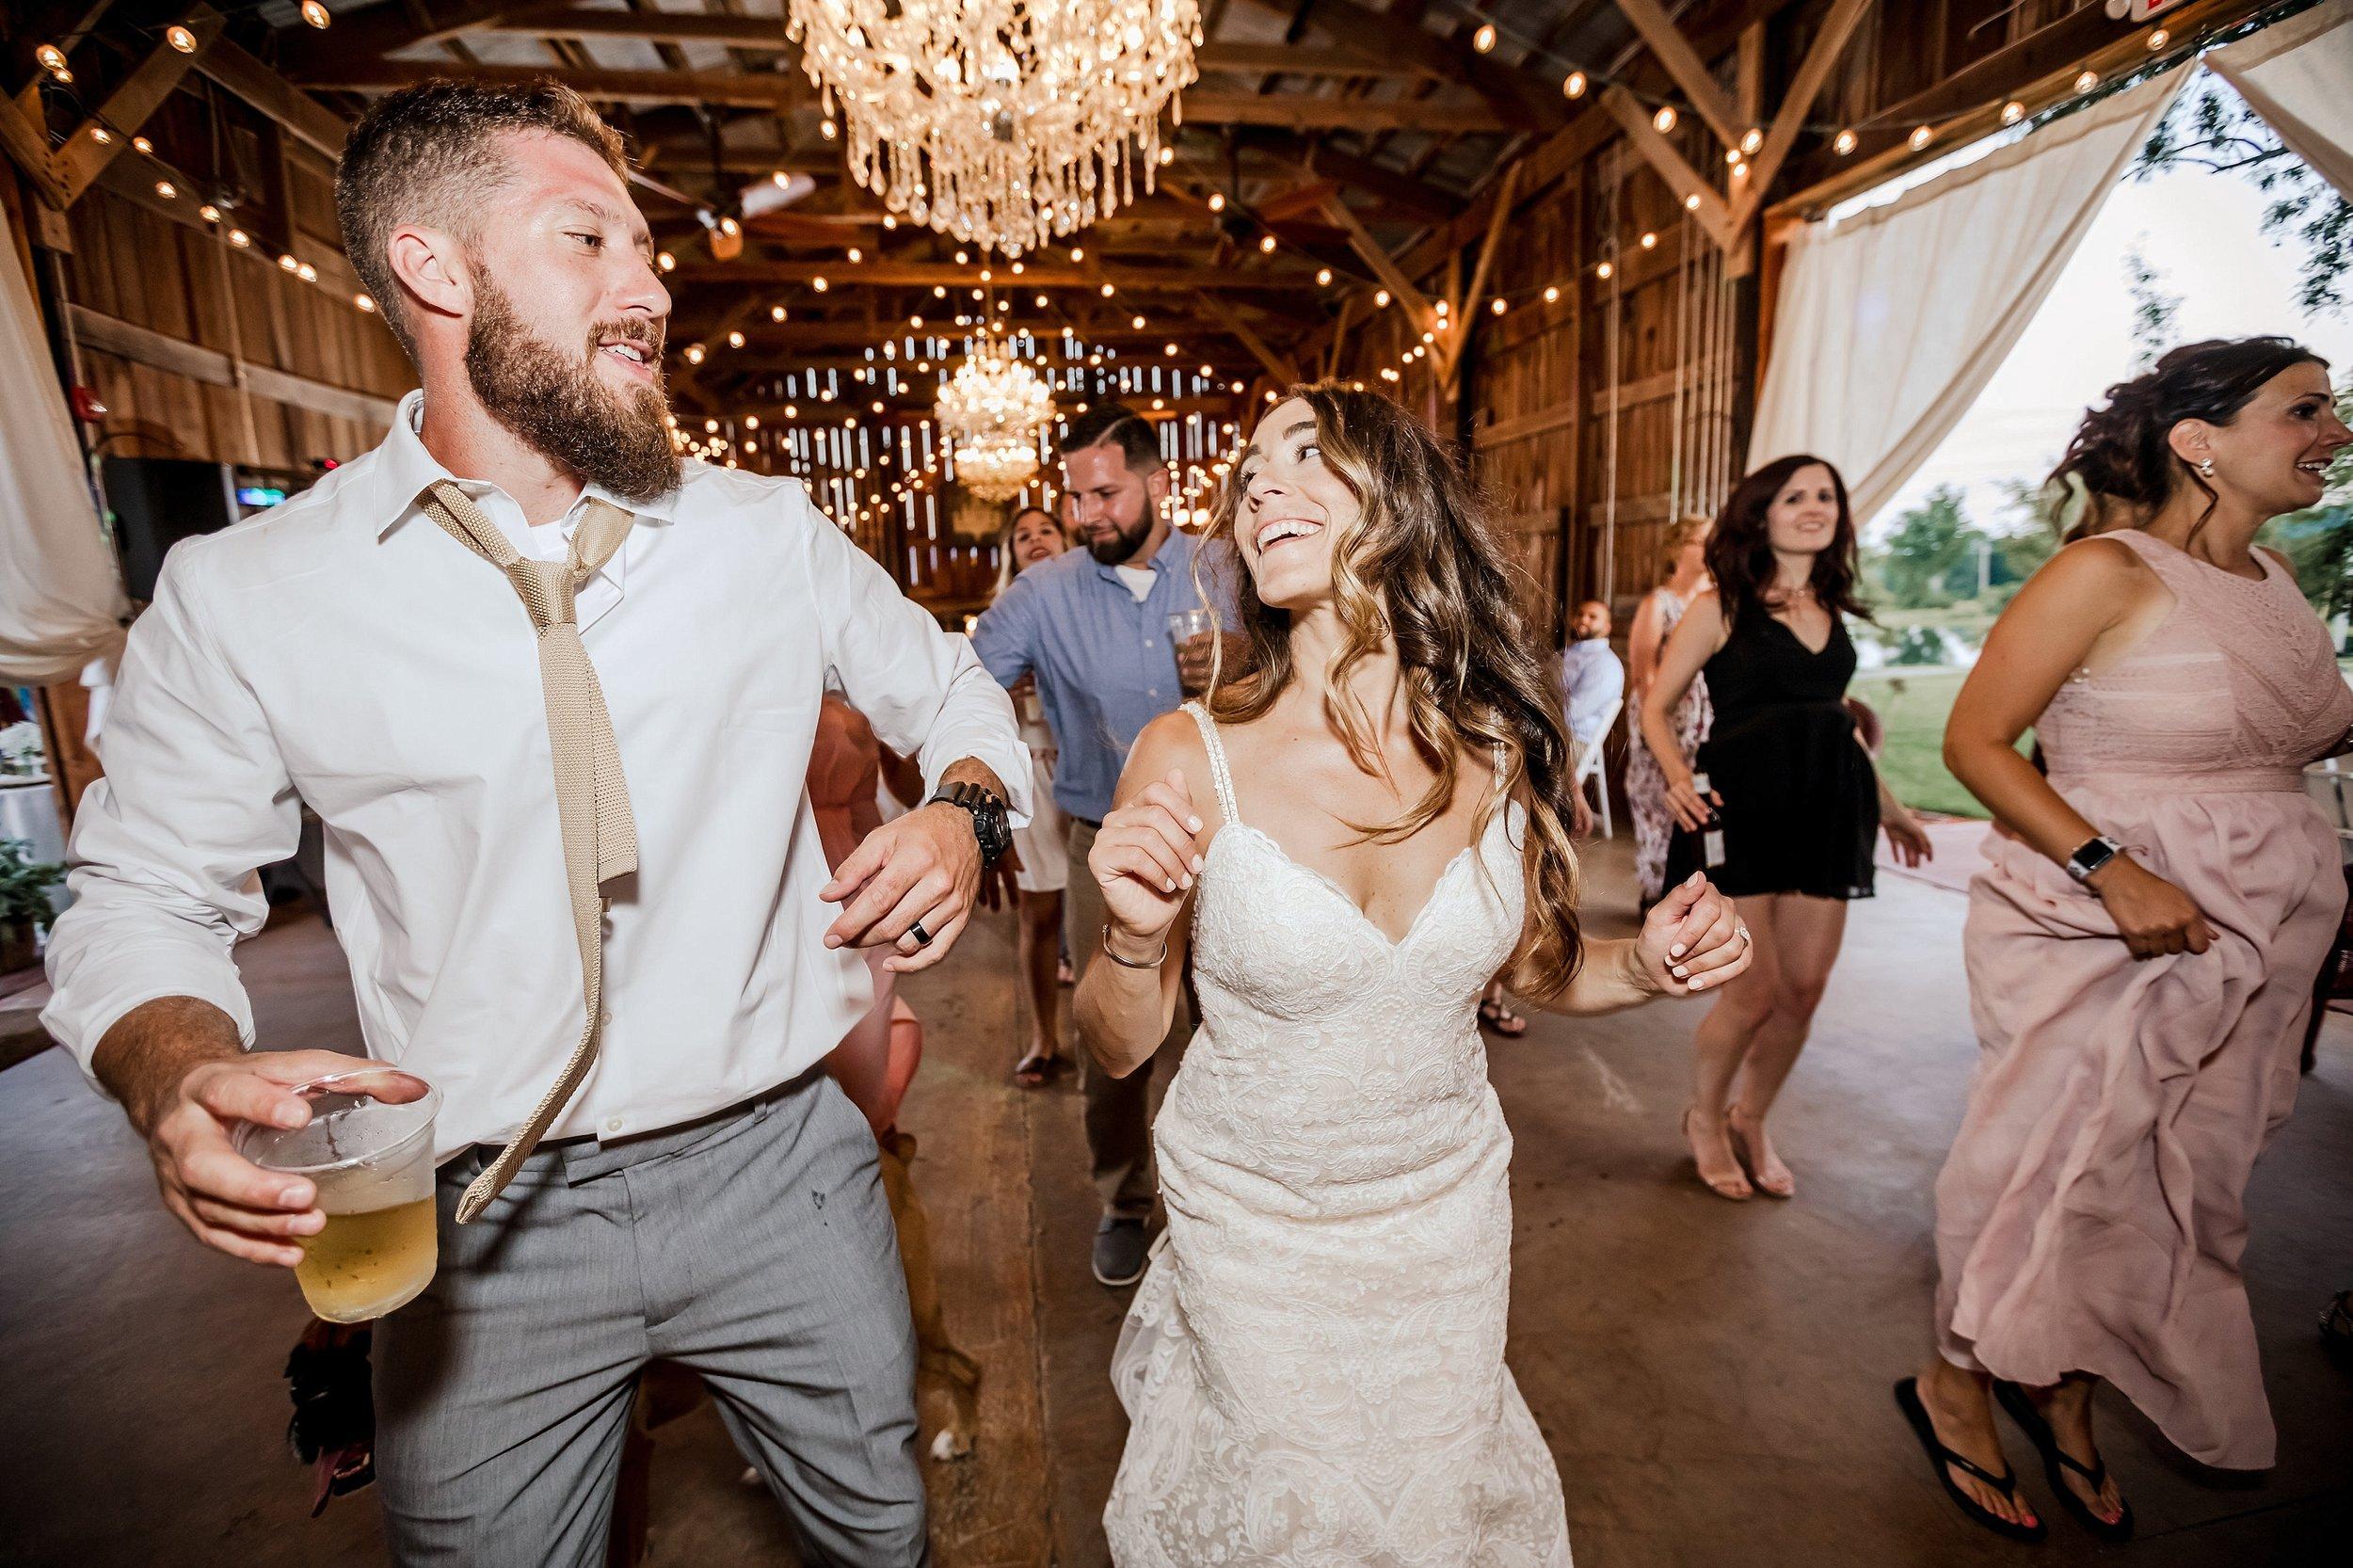 Gilbertsville-Farmhouse-Wedding-Photographer_0006.jpg